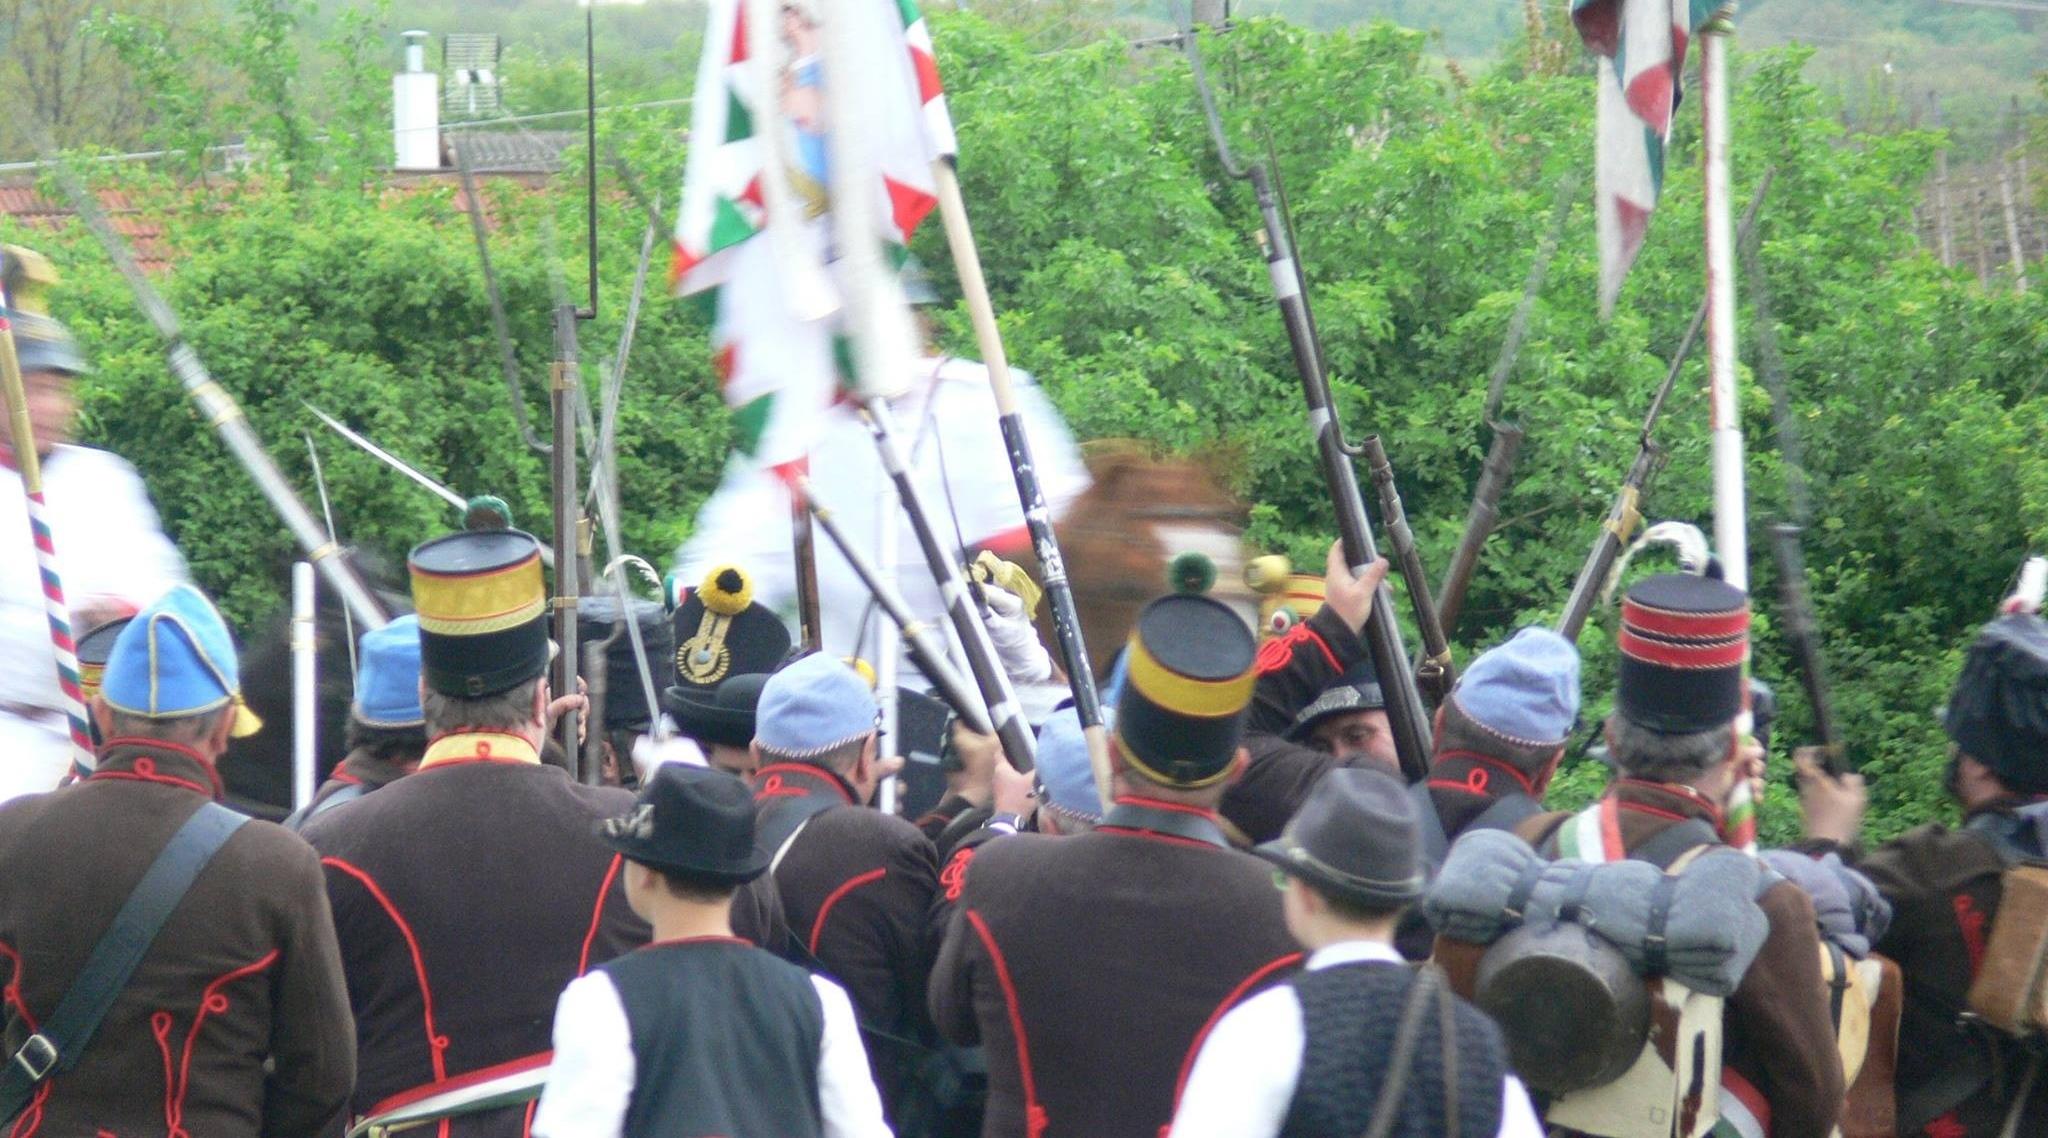 Felvidéki hadjárat 2016